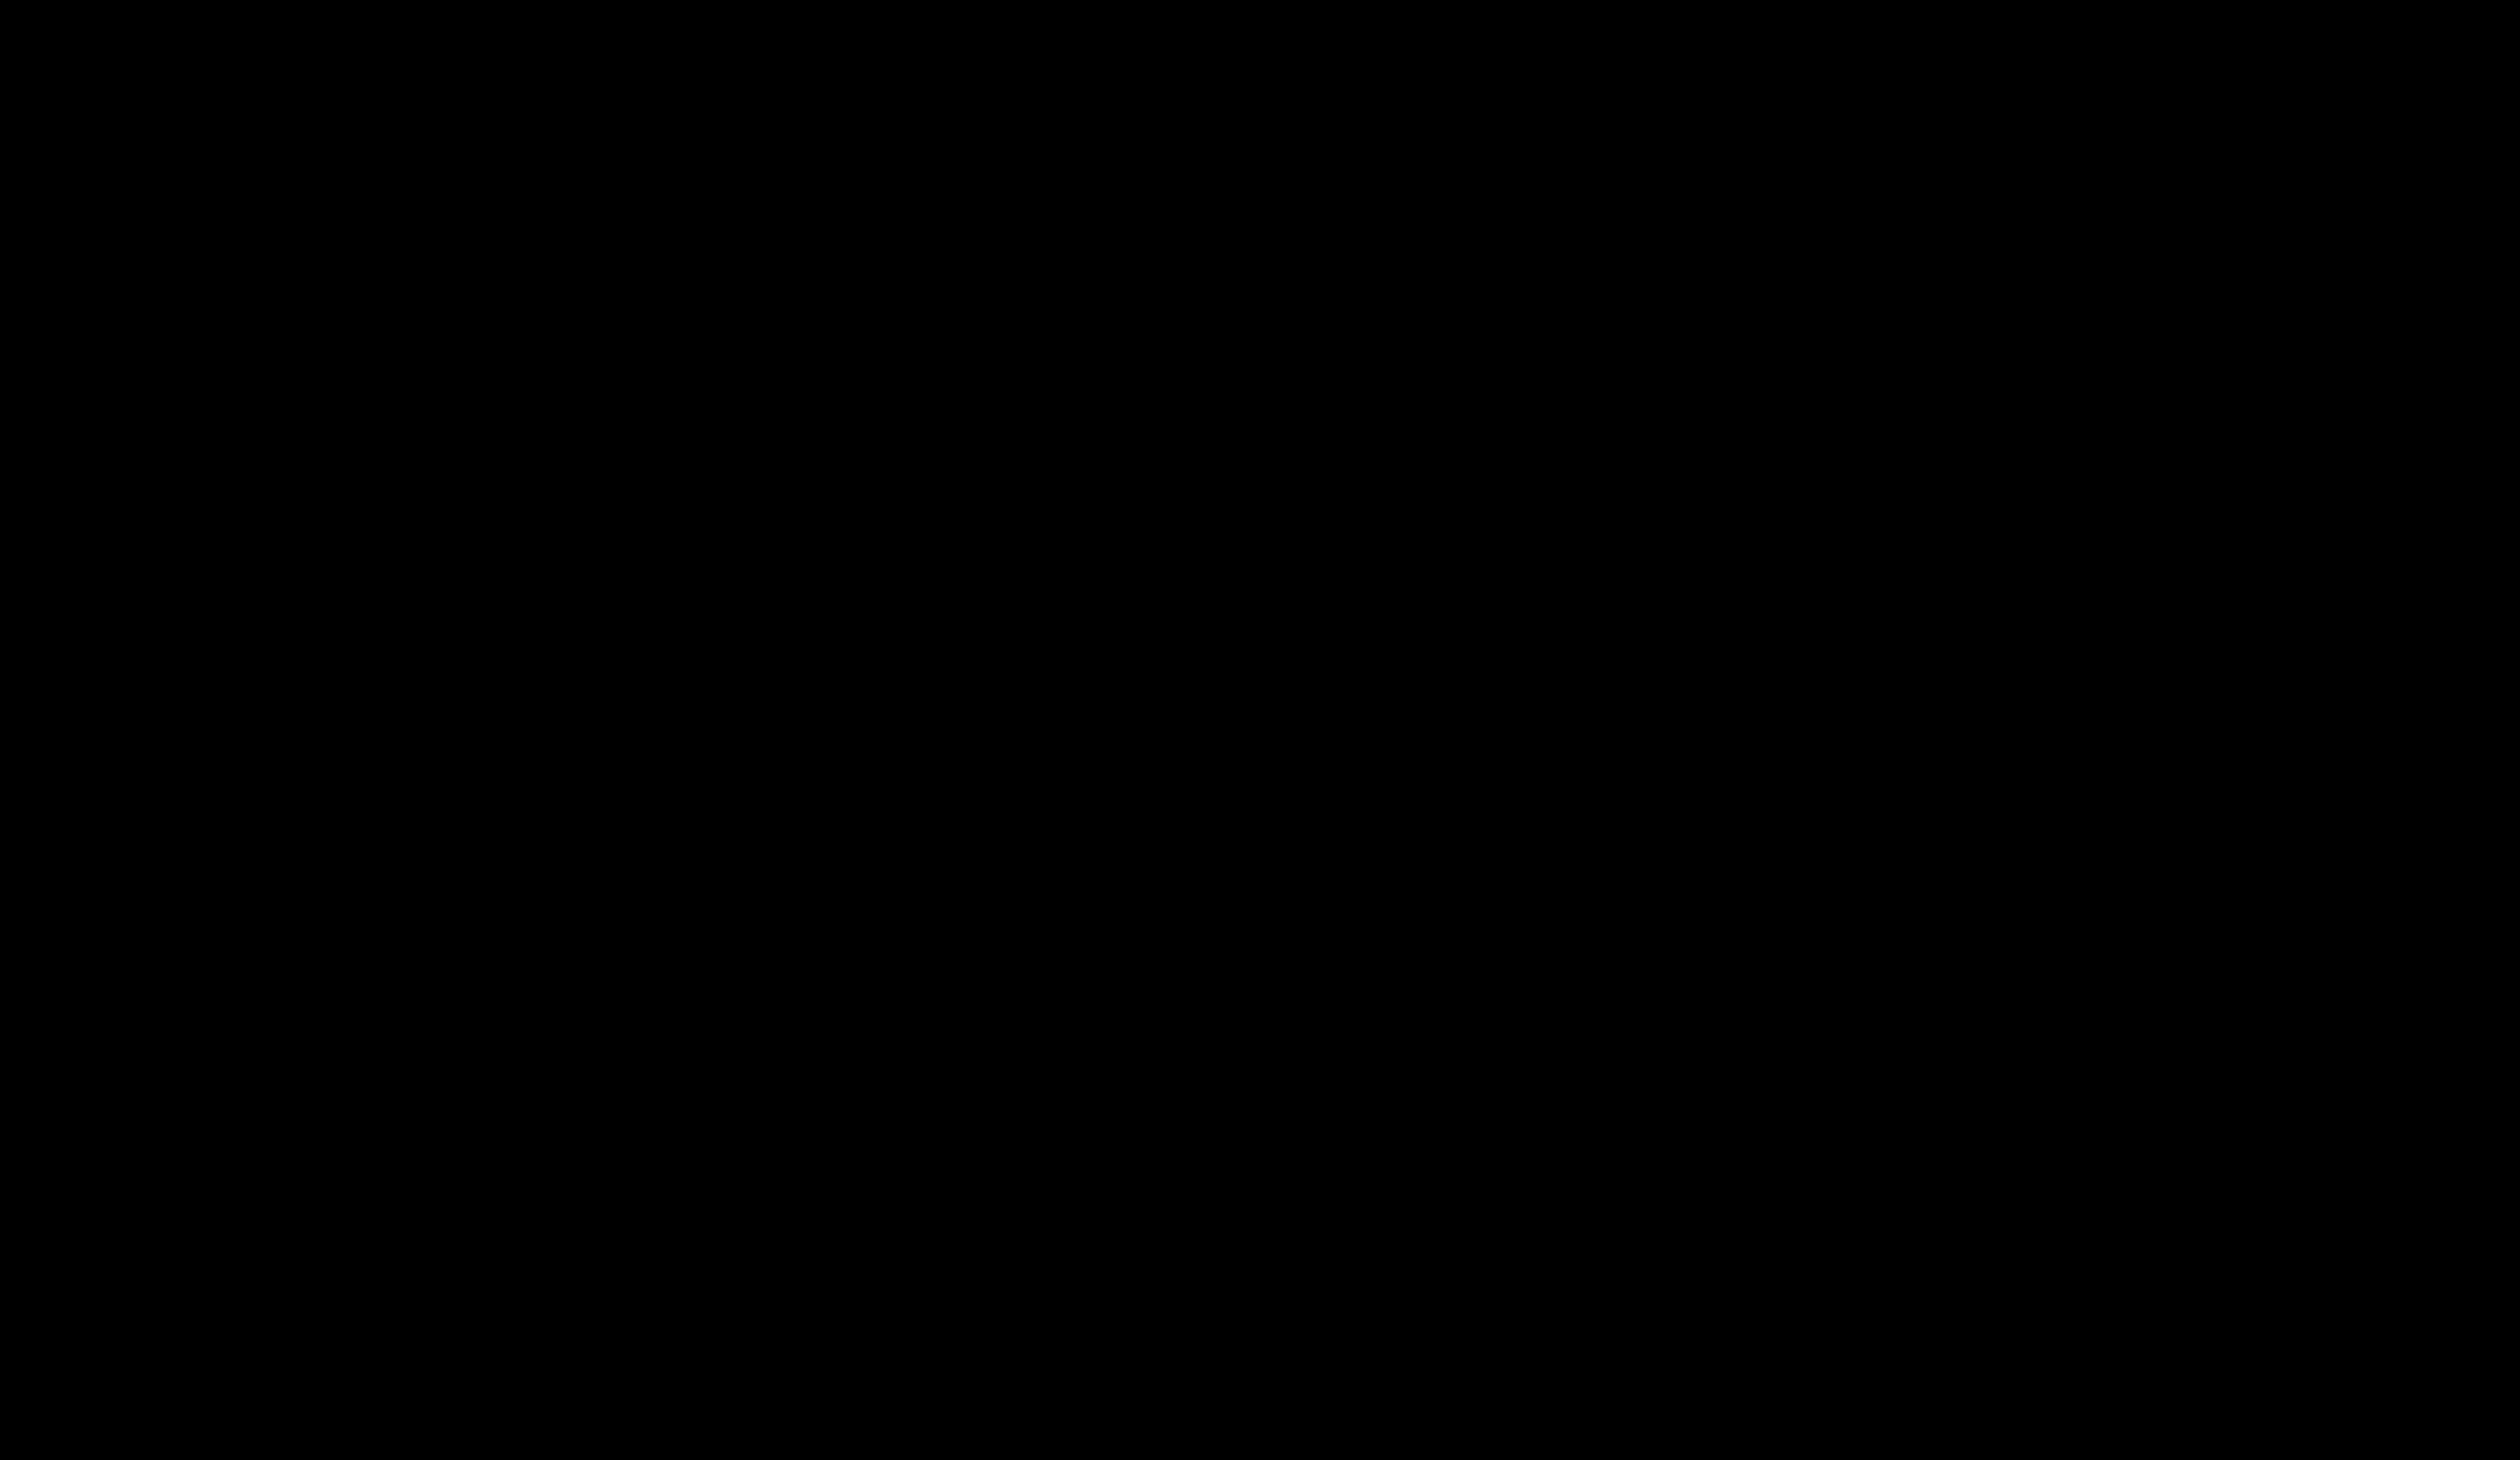 20200205_121859